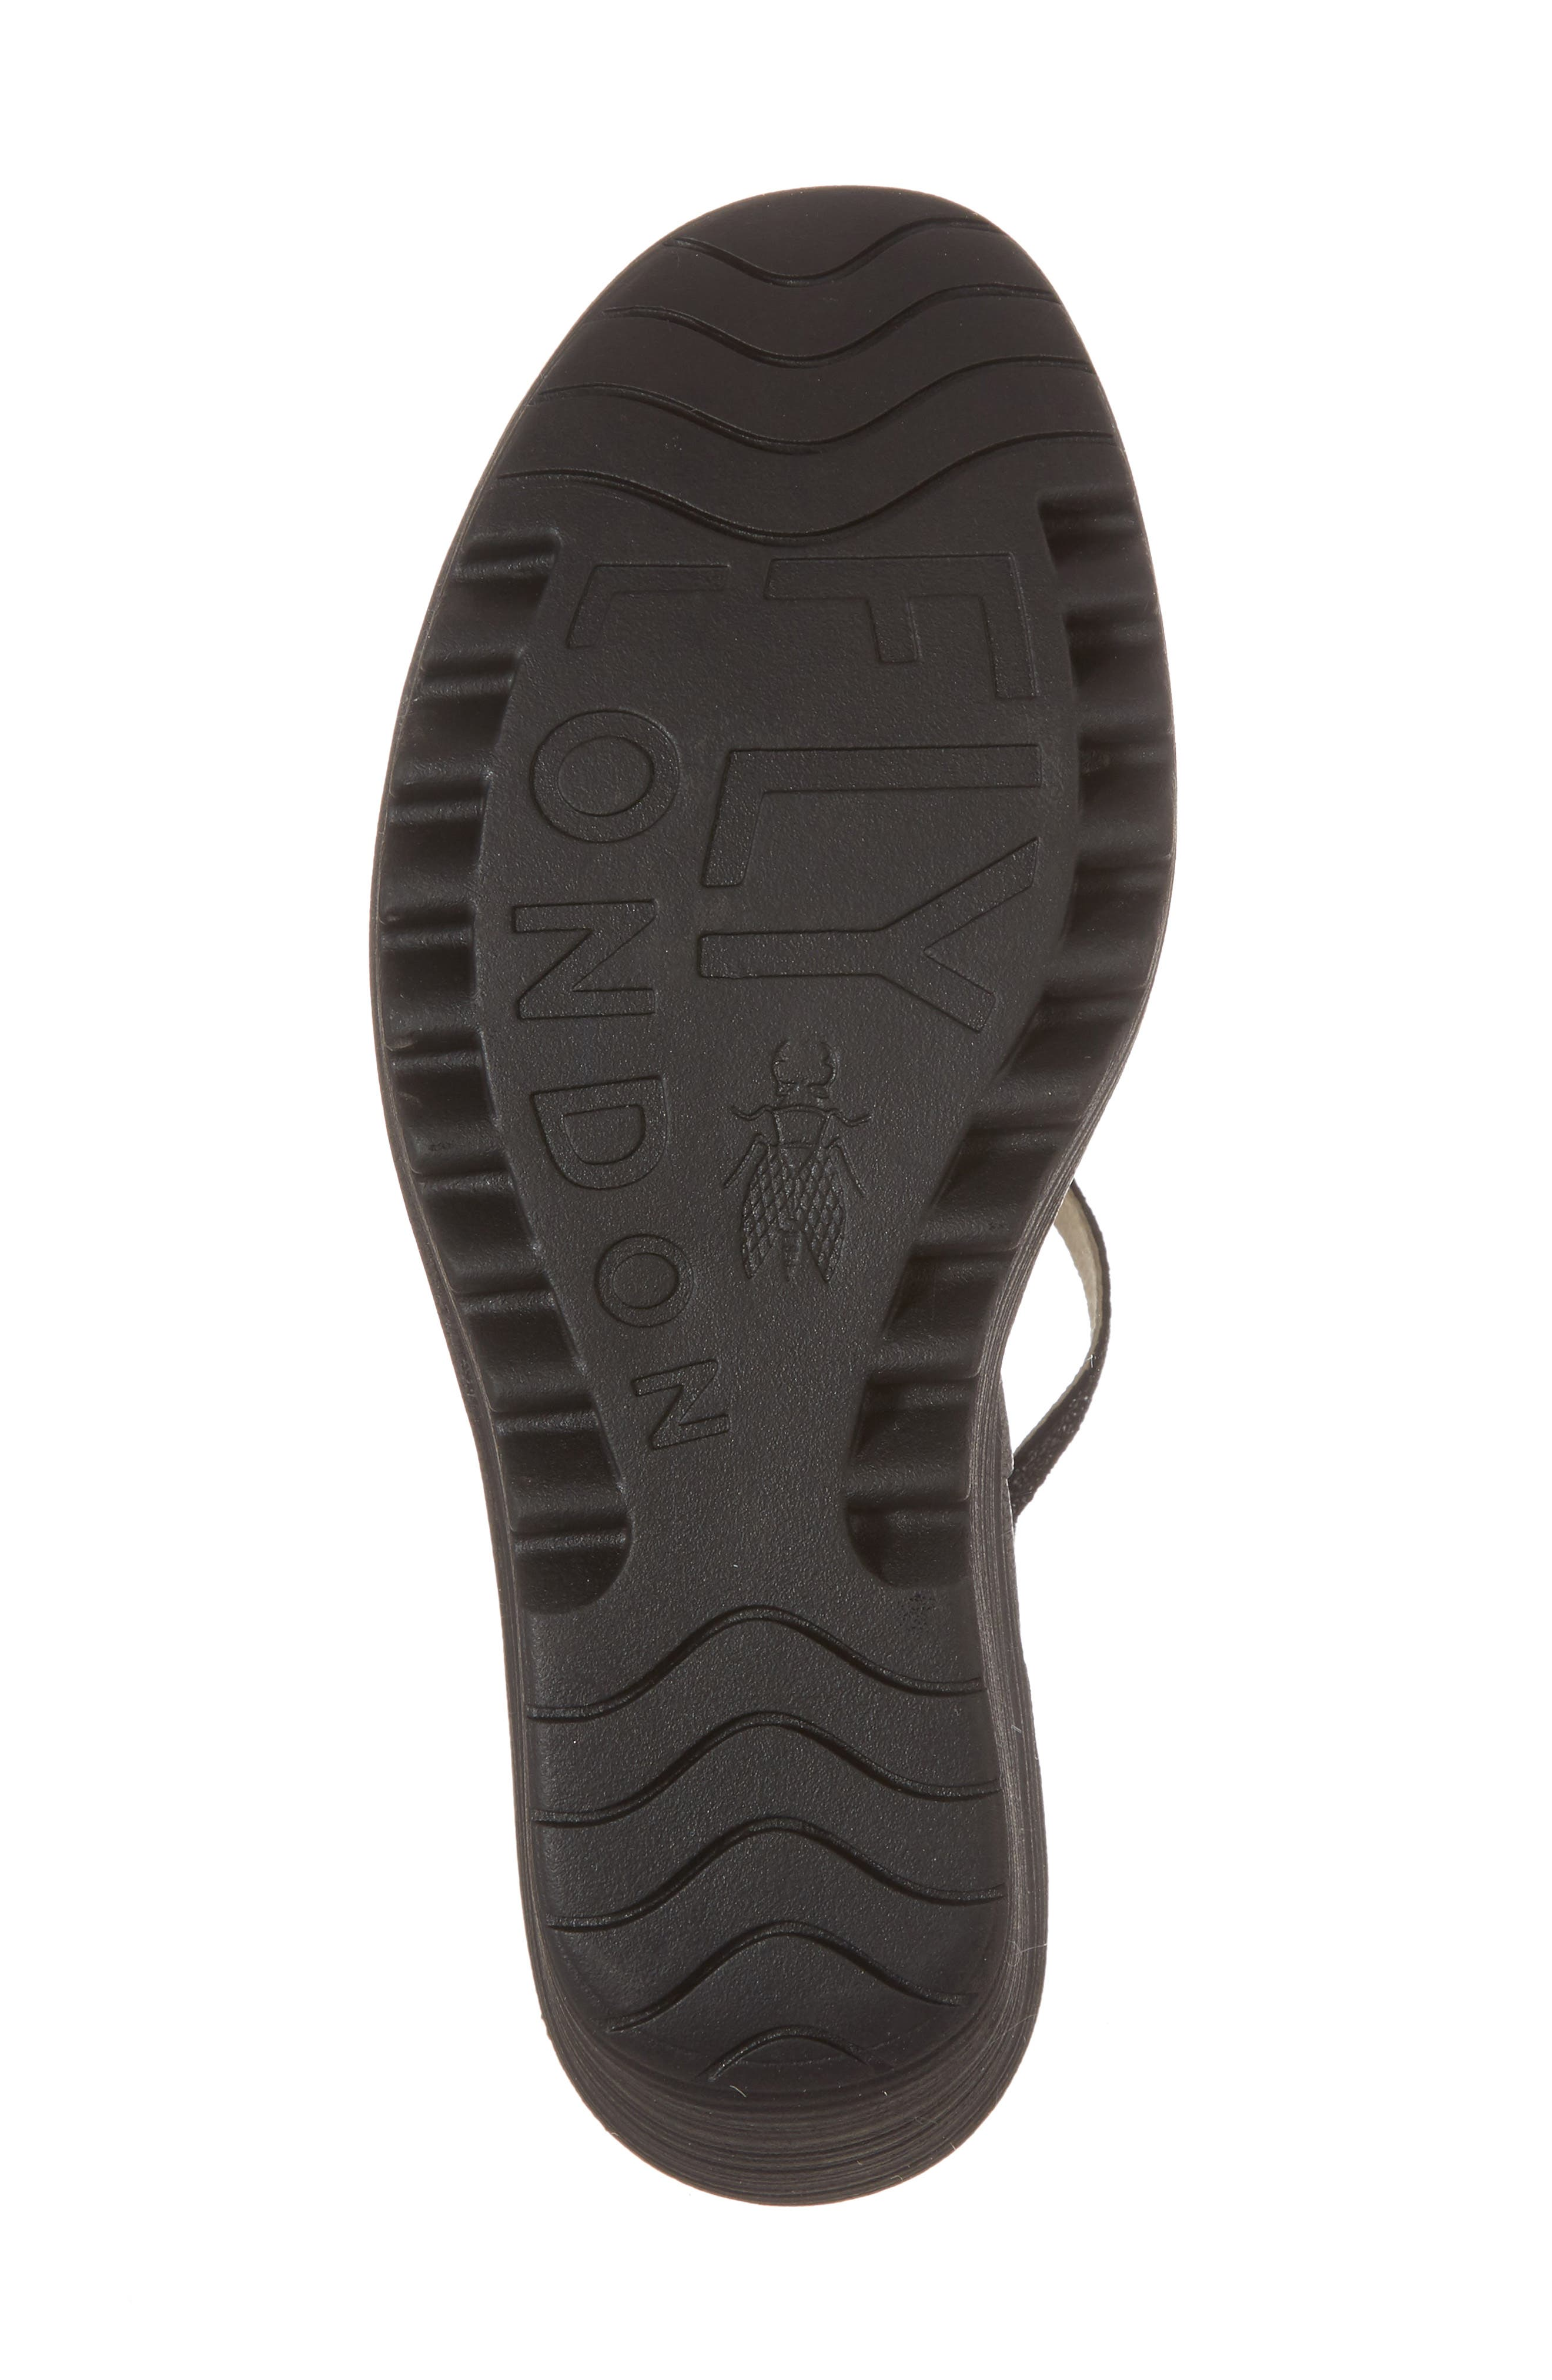 Yora Wedge Sandal,                             Alternate thumbnail 6, color,                             Black/ Graphite Leather